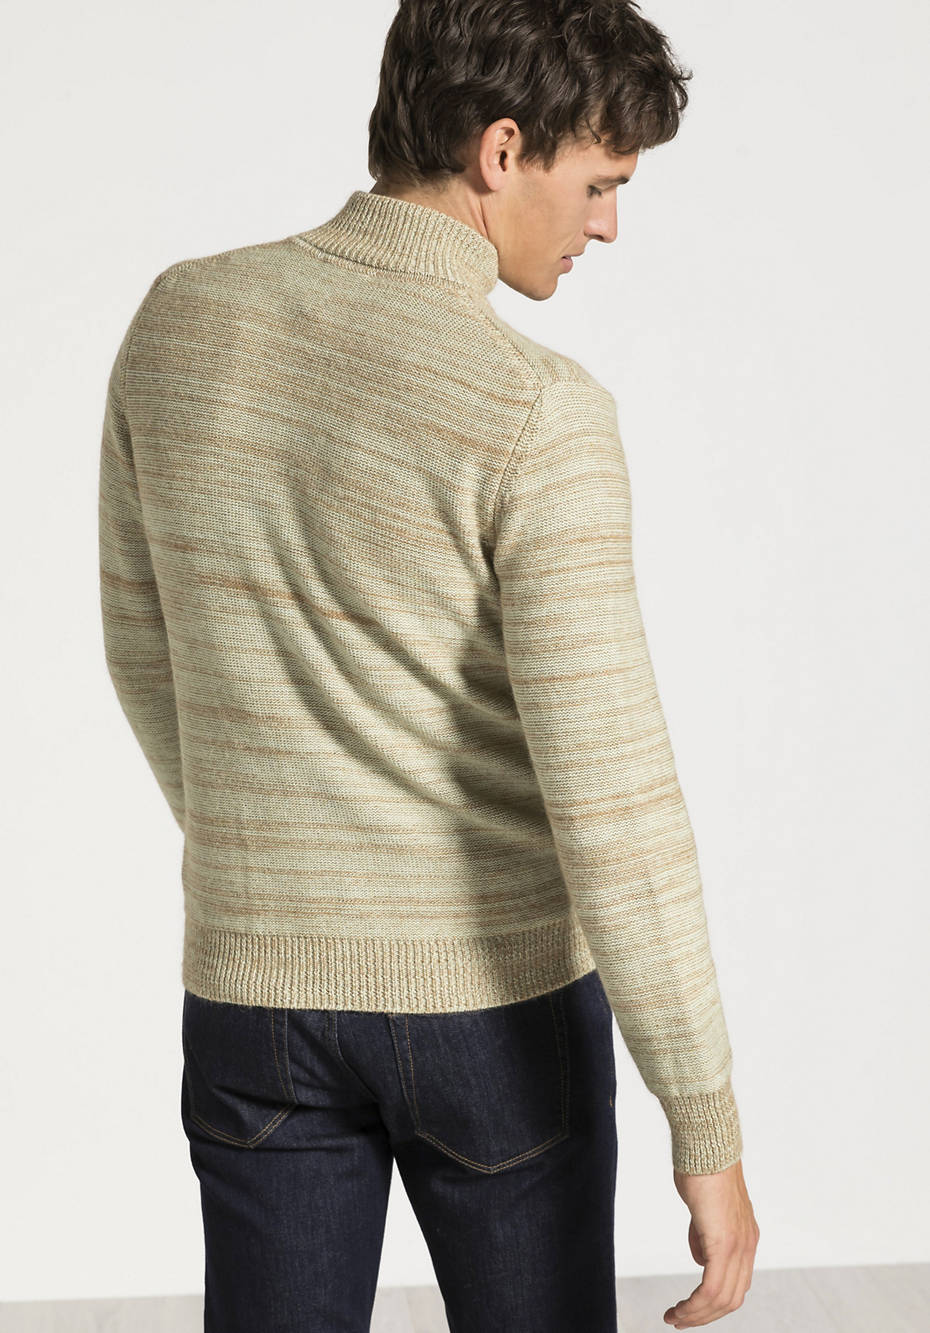 Cardigan made of alpaca and organic cotton